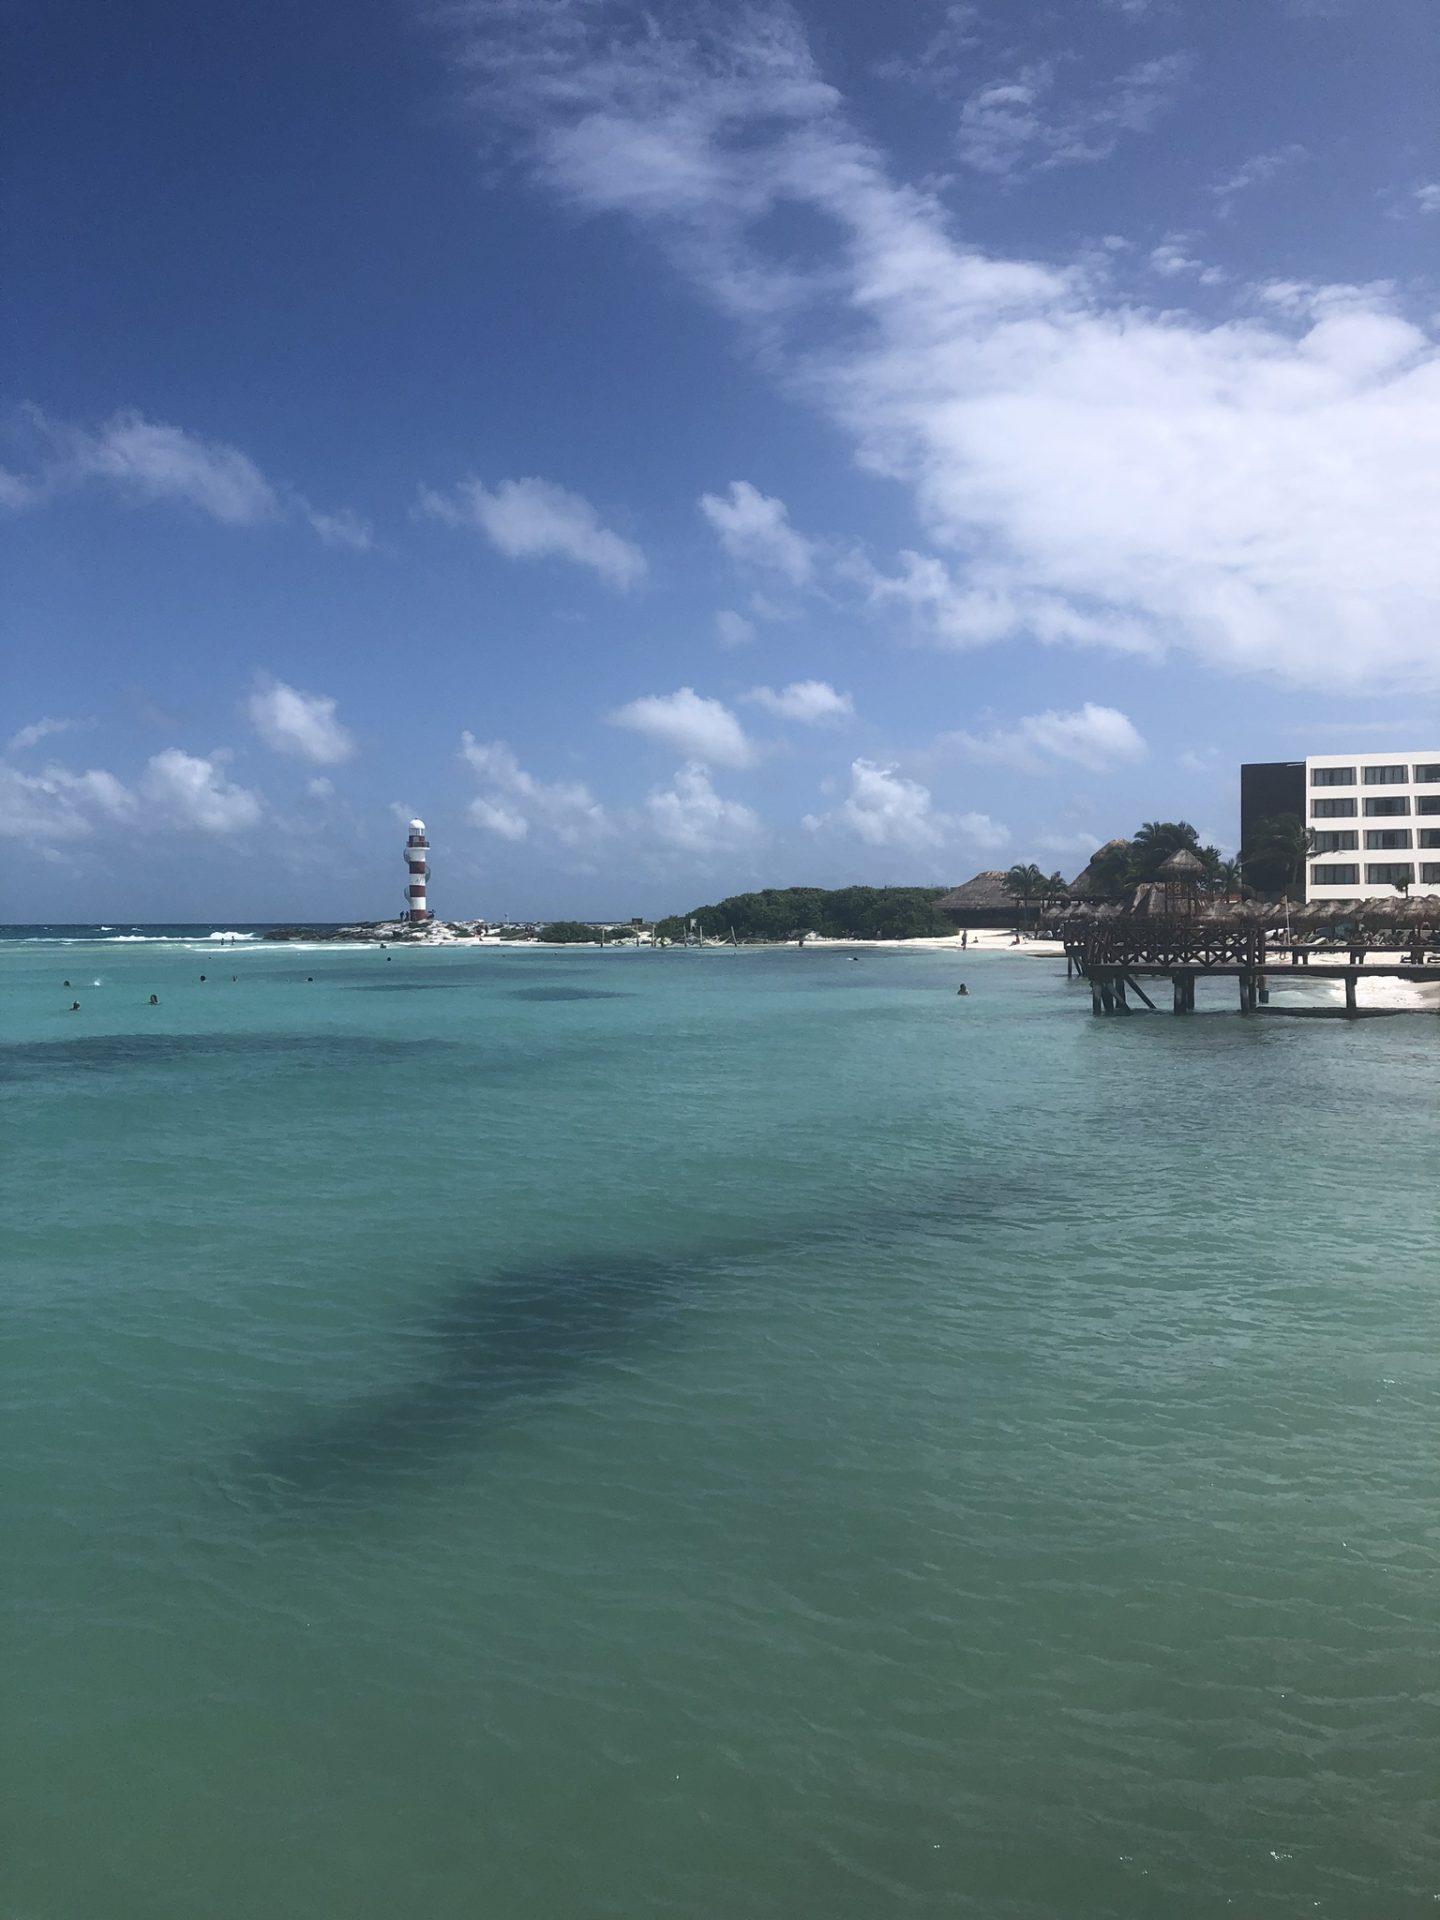 Beautiful Caribbean sea in Cancun, Mexico